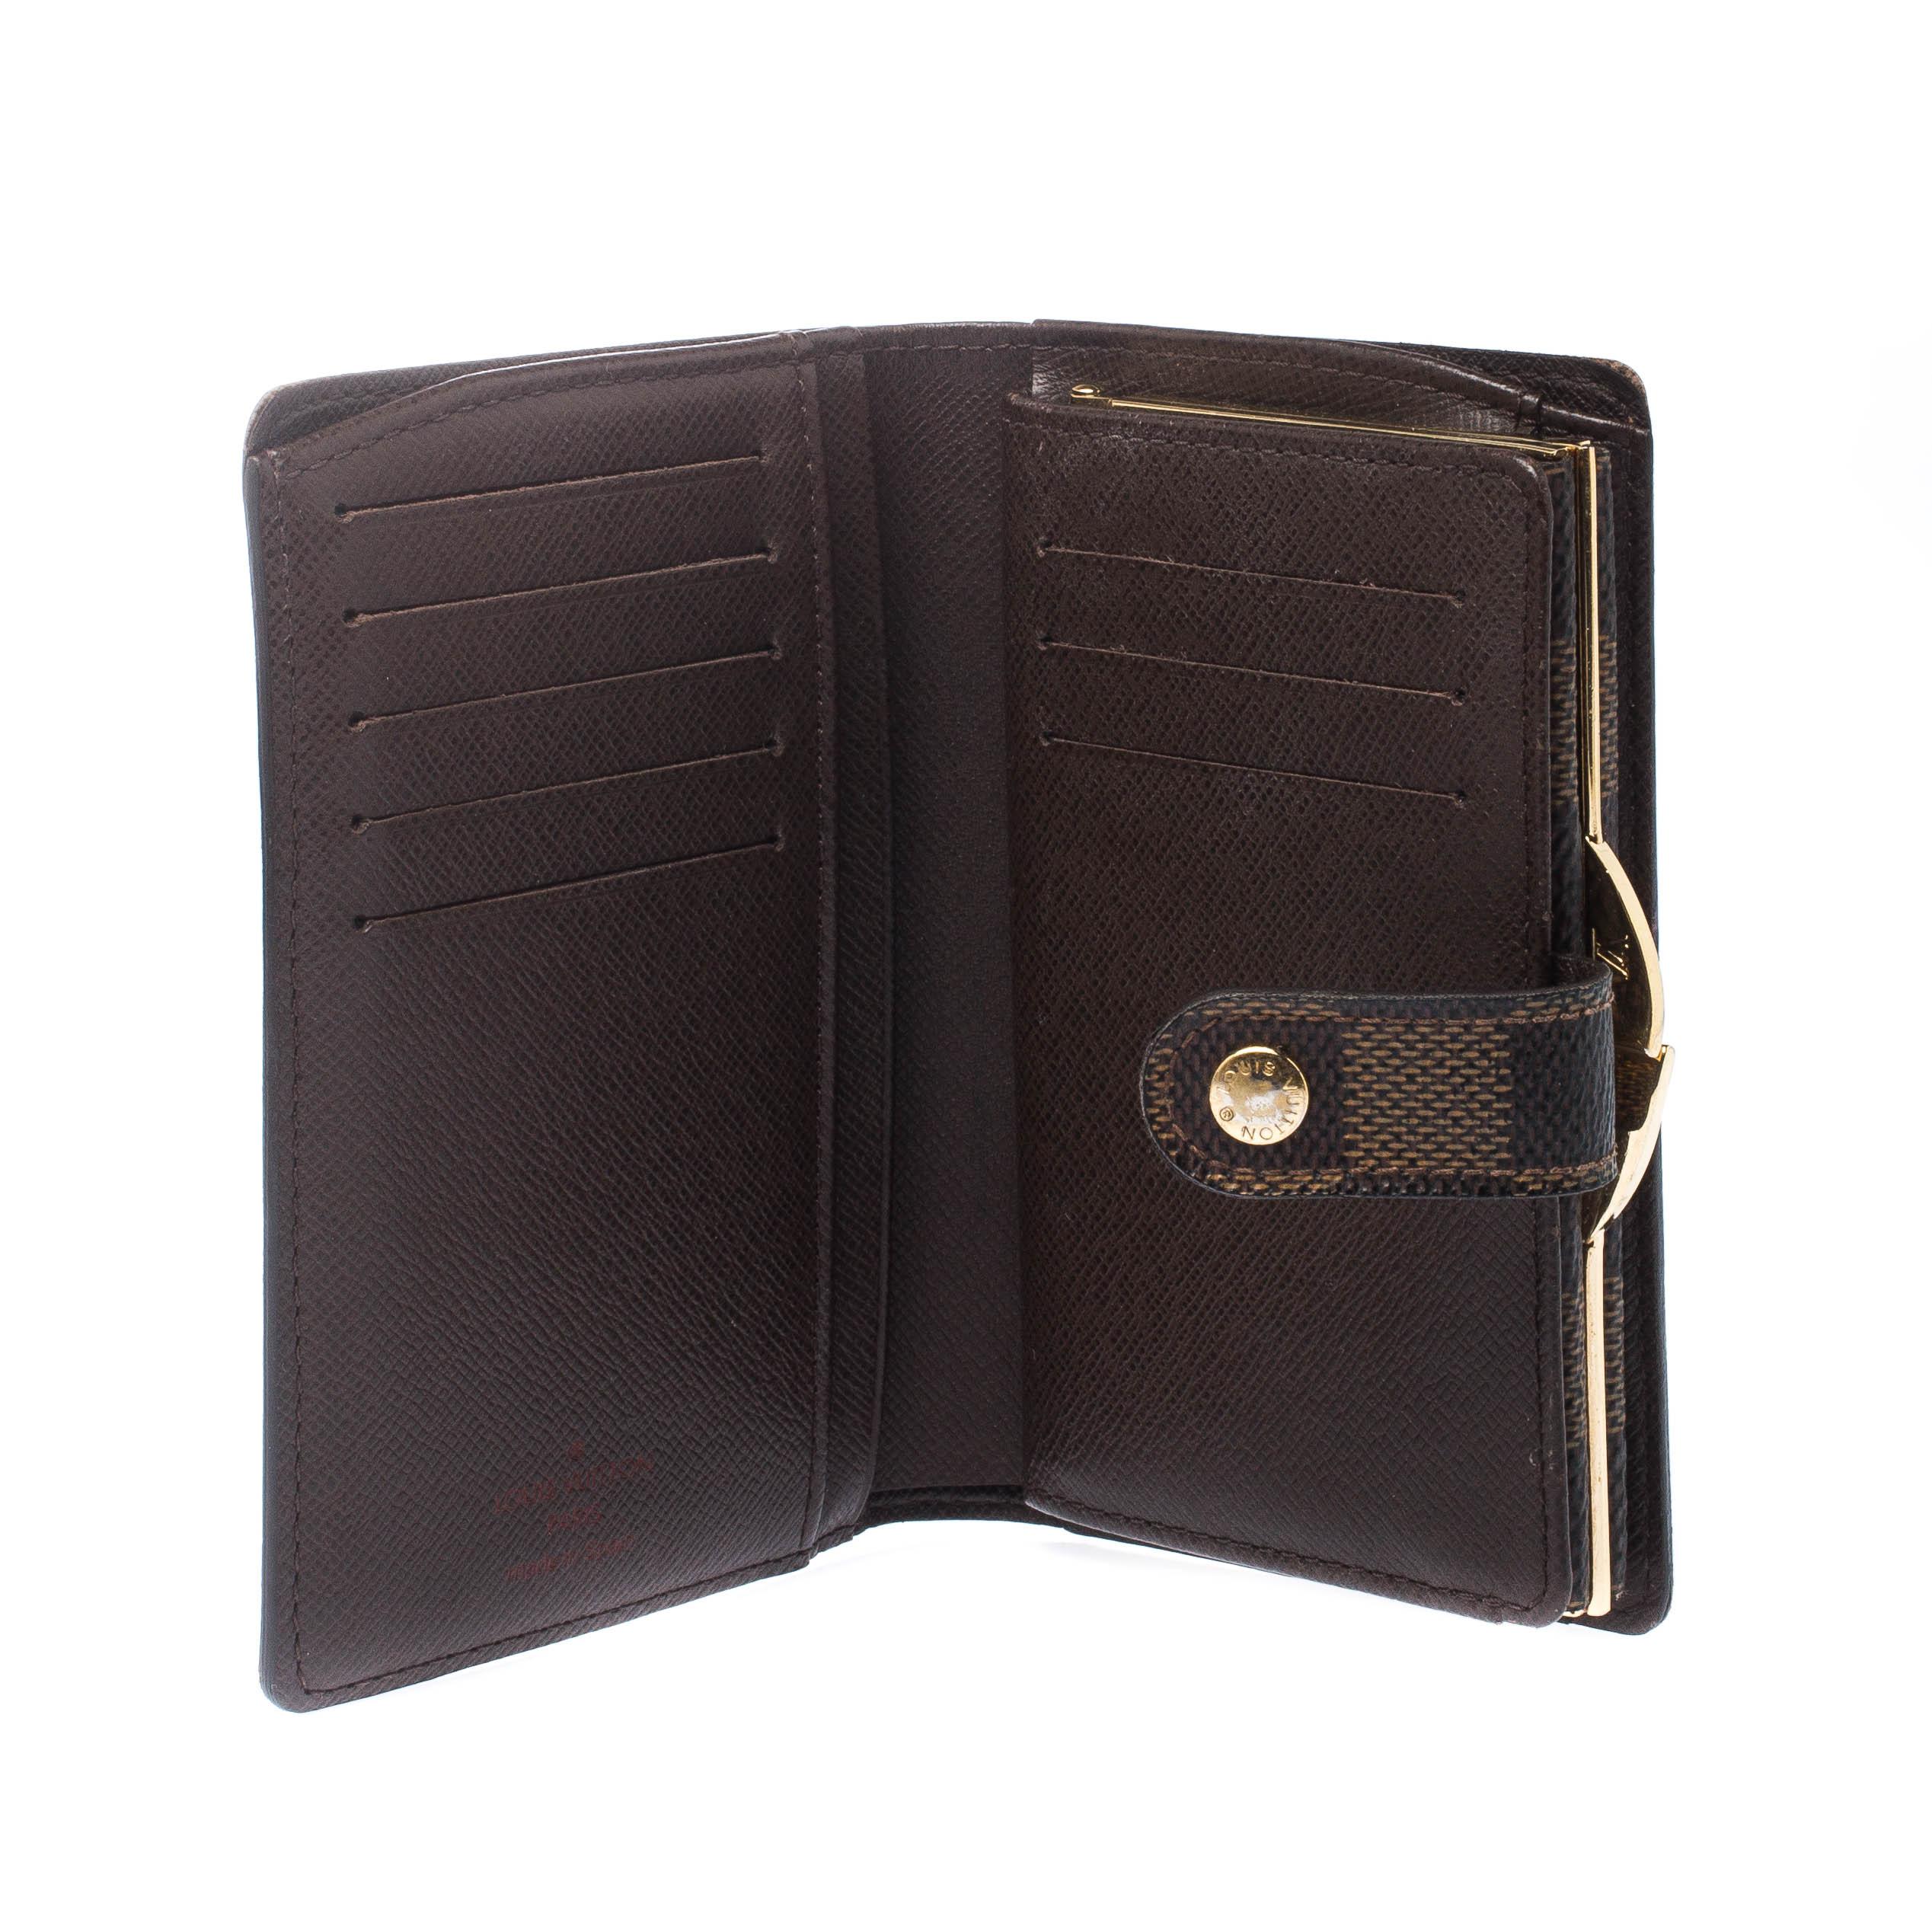 Louis Vuitton Damier Ebene Tela French Wallet